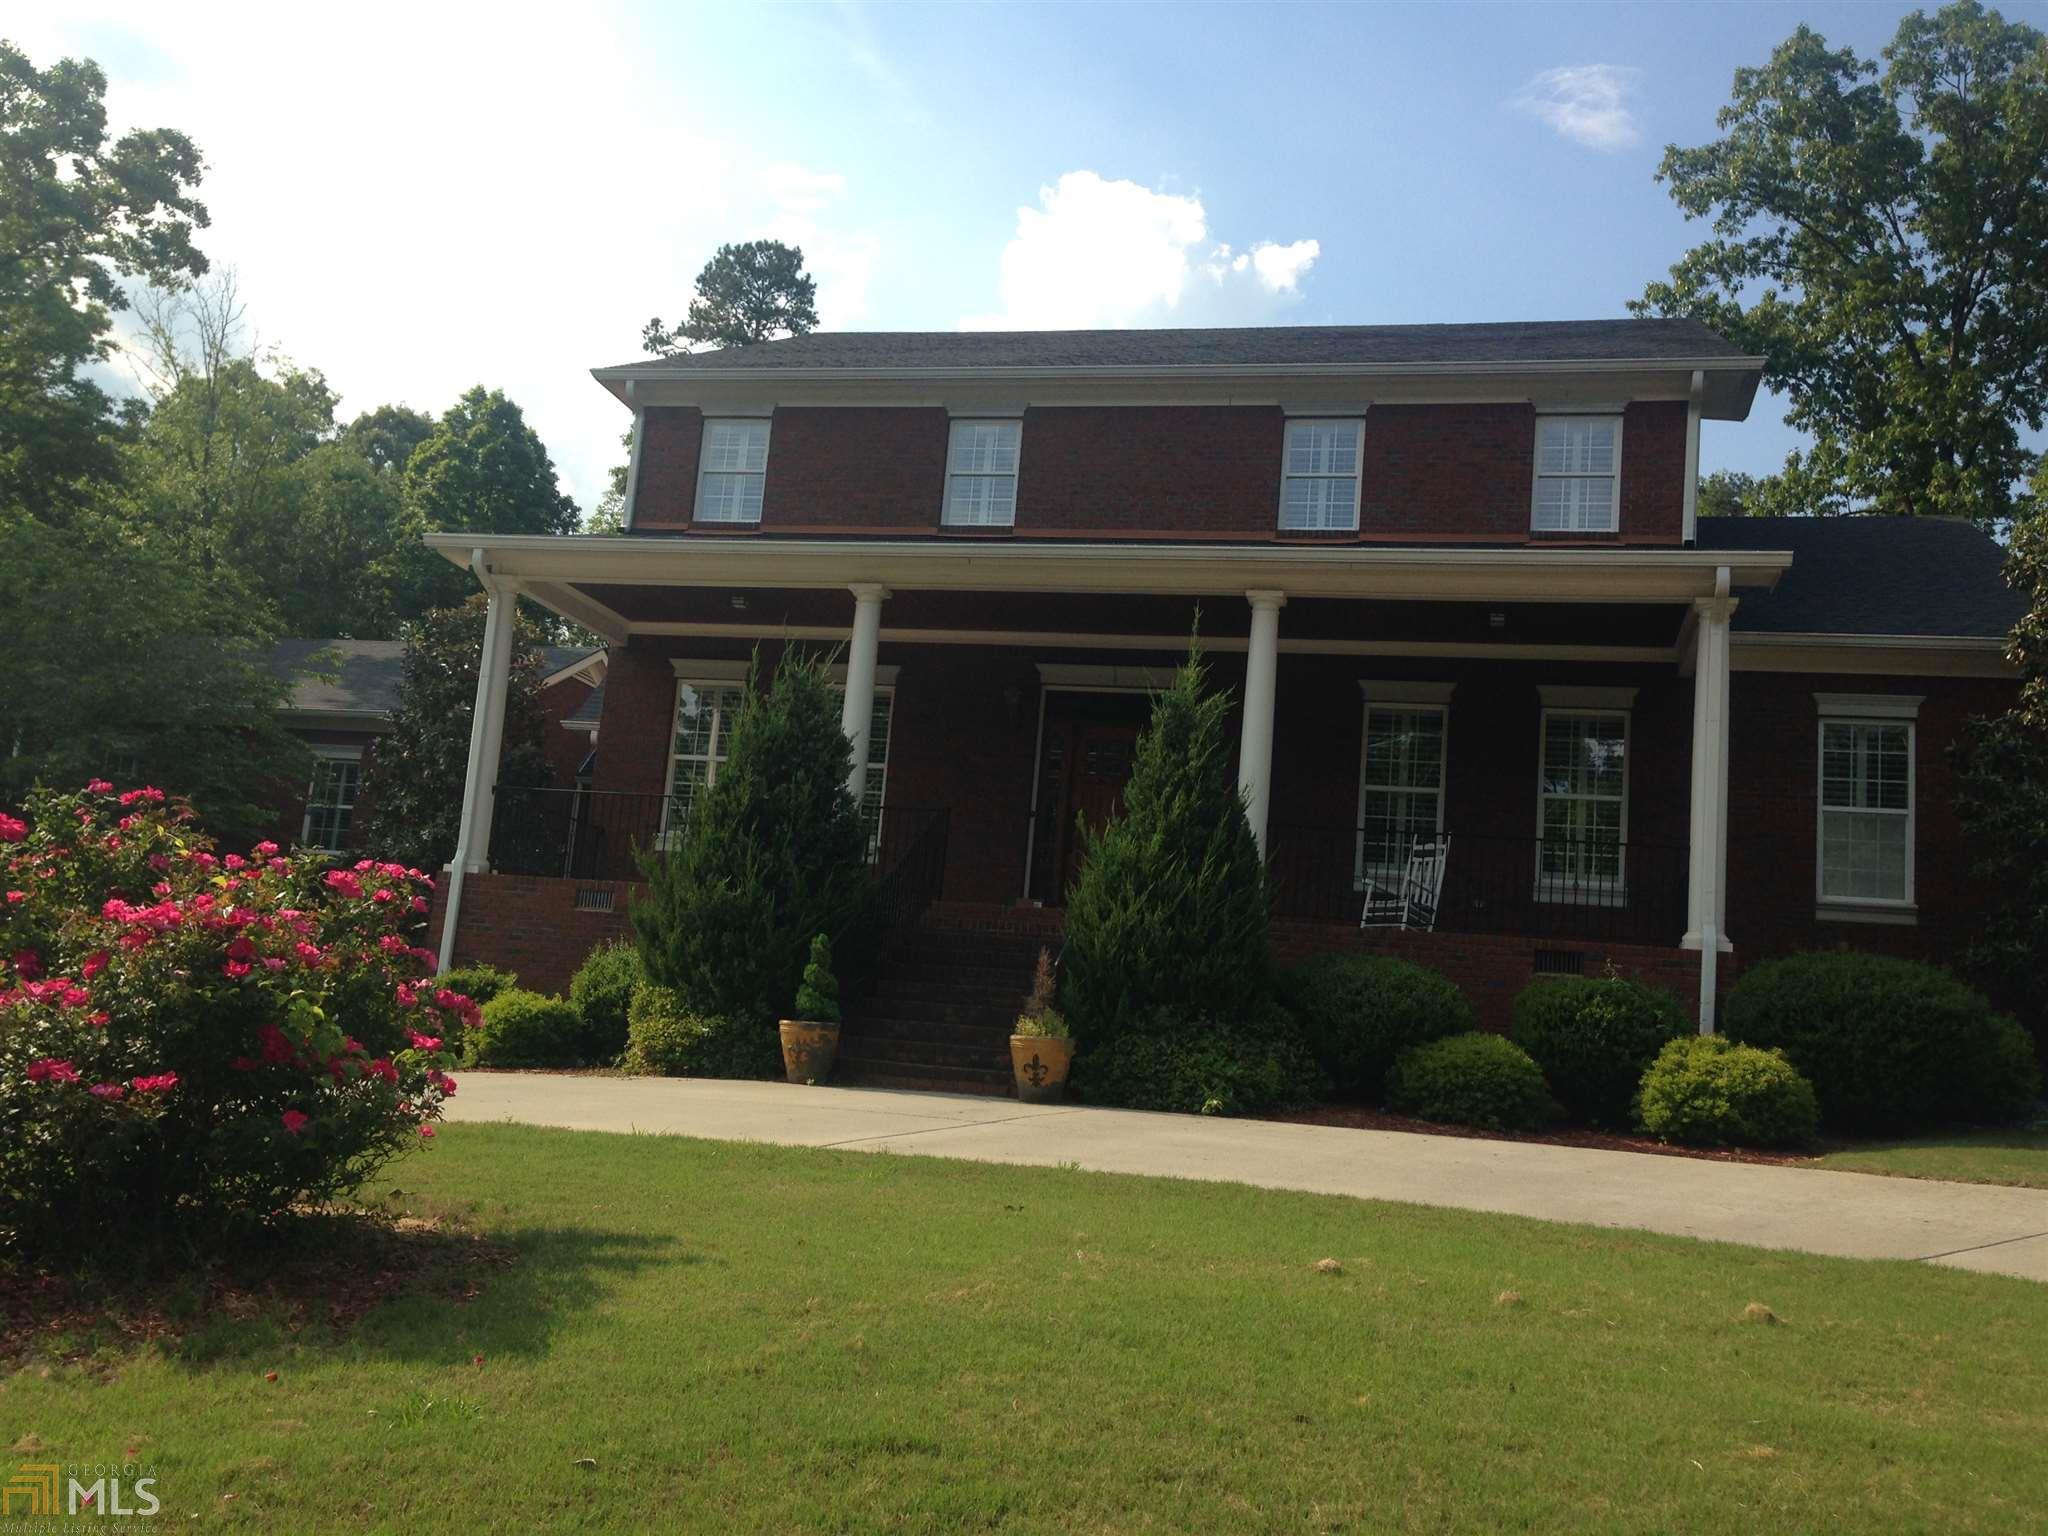 424 Woodlawn Drive, Cedartown, GA 30125